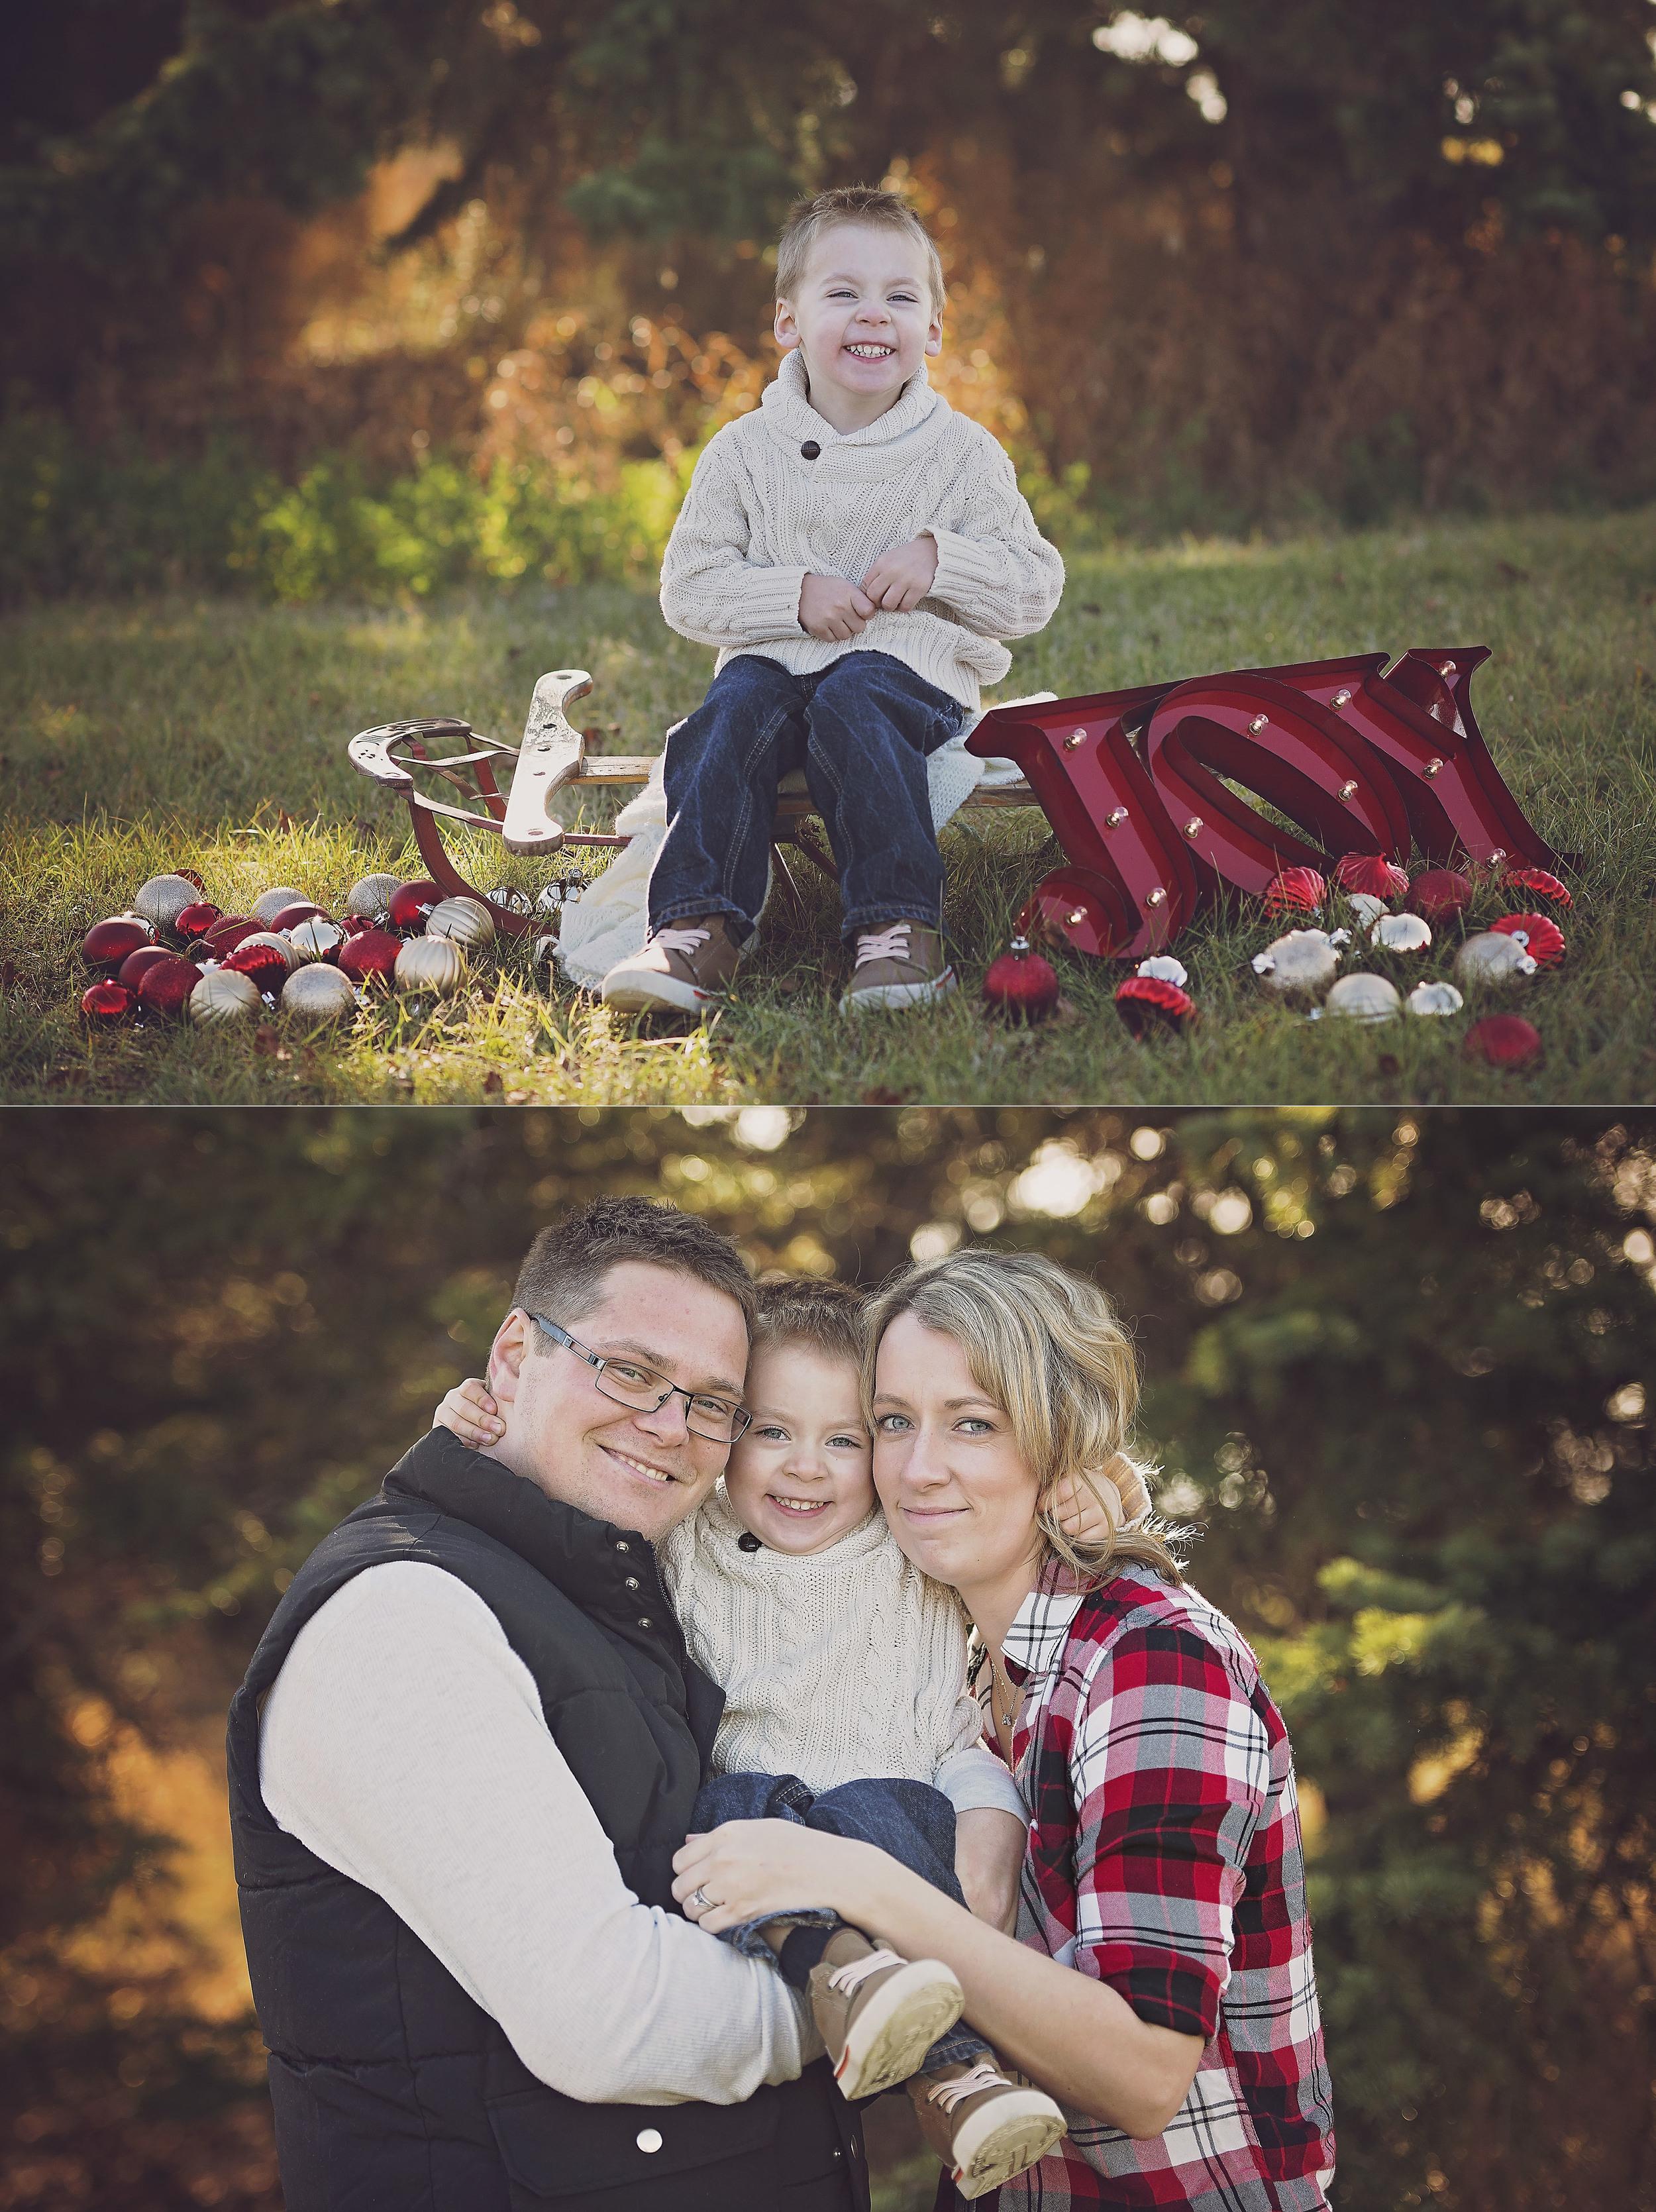 Regina_Family_Photography_minisessions_01_5.jpg